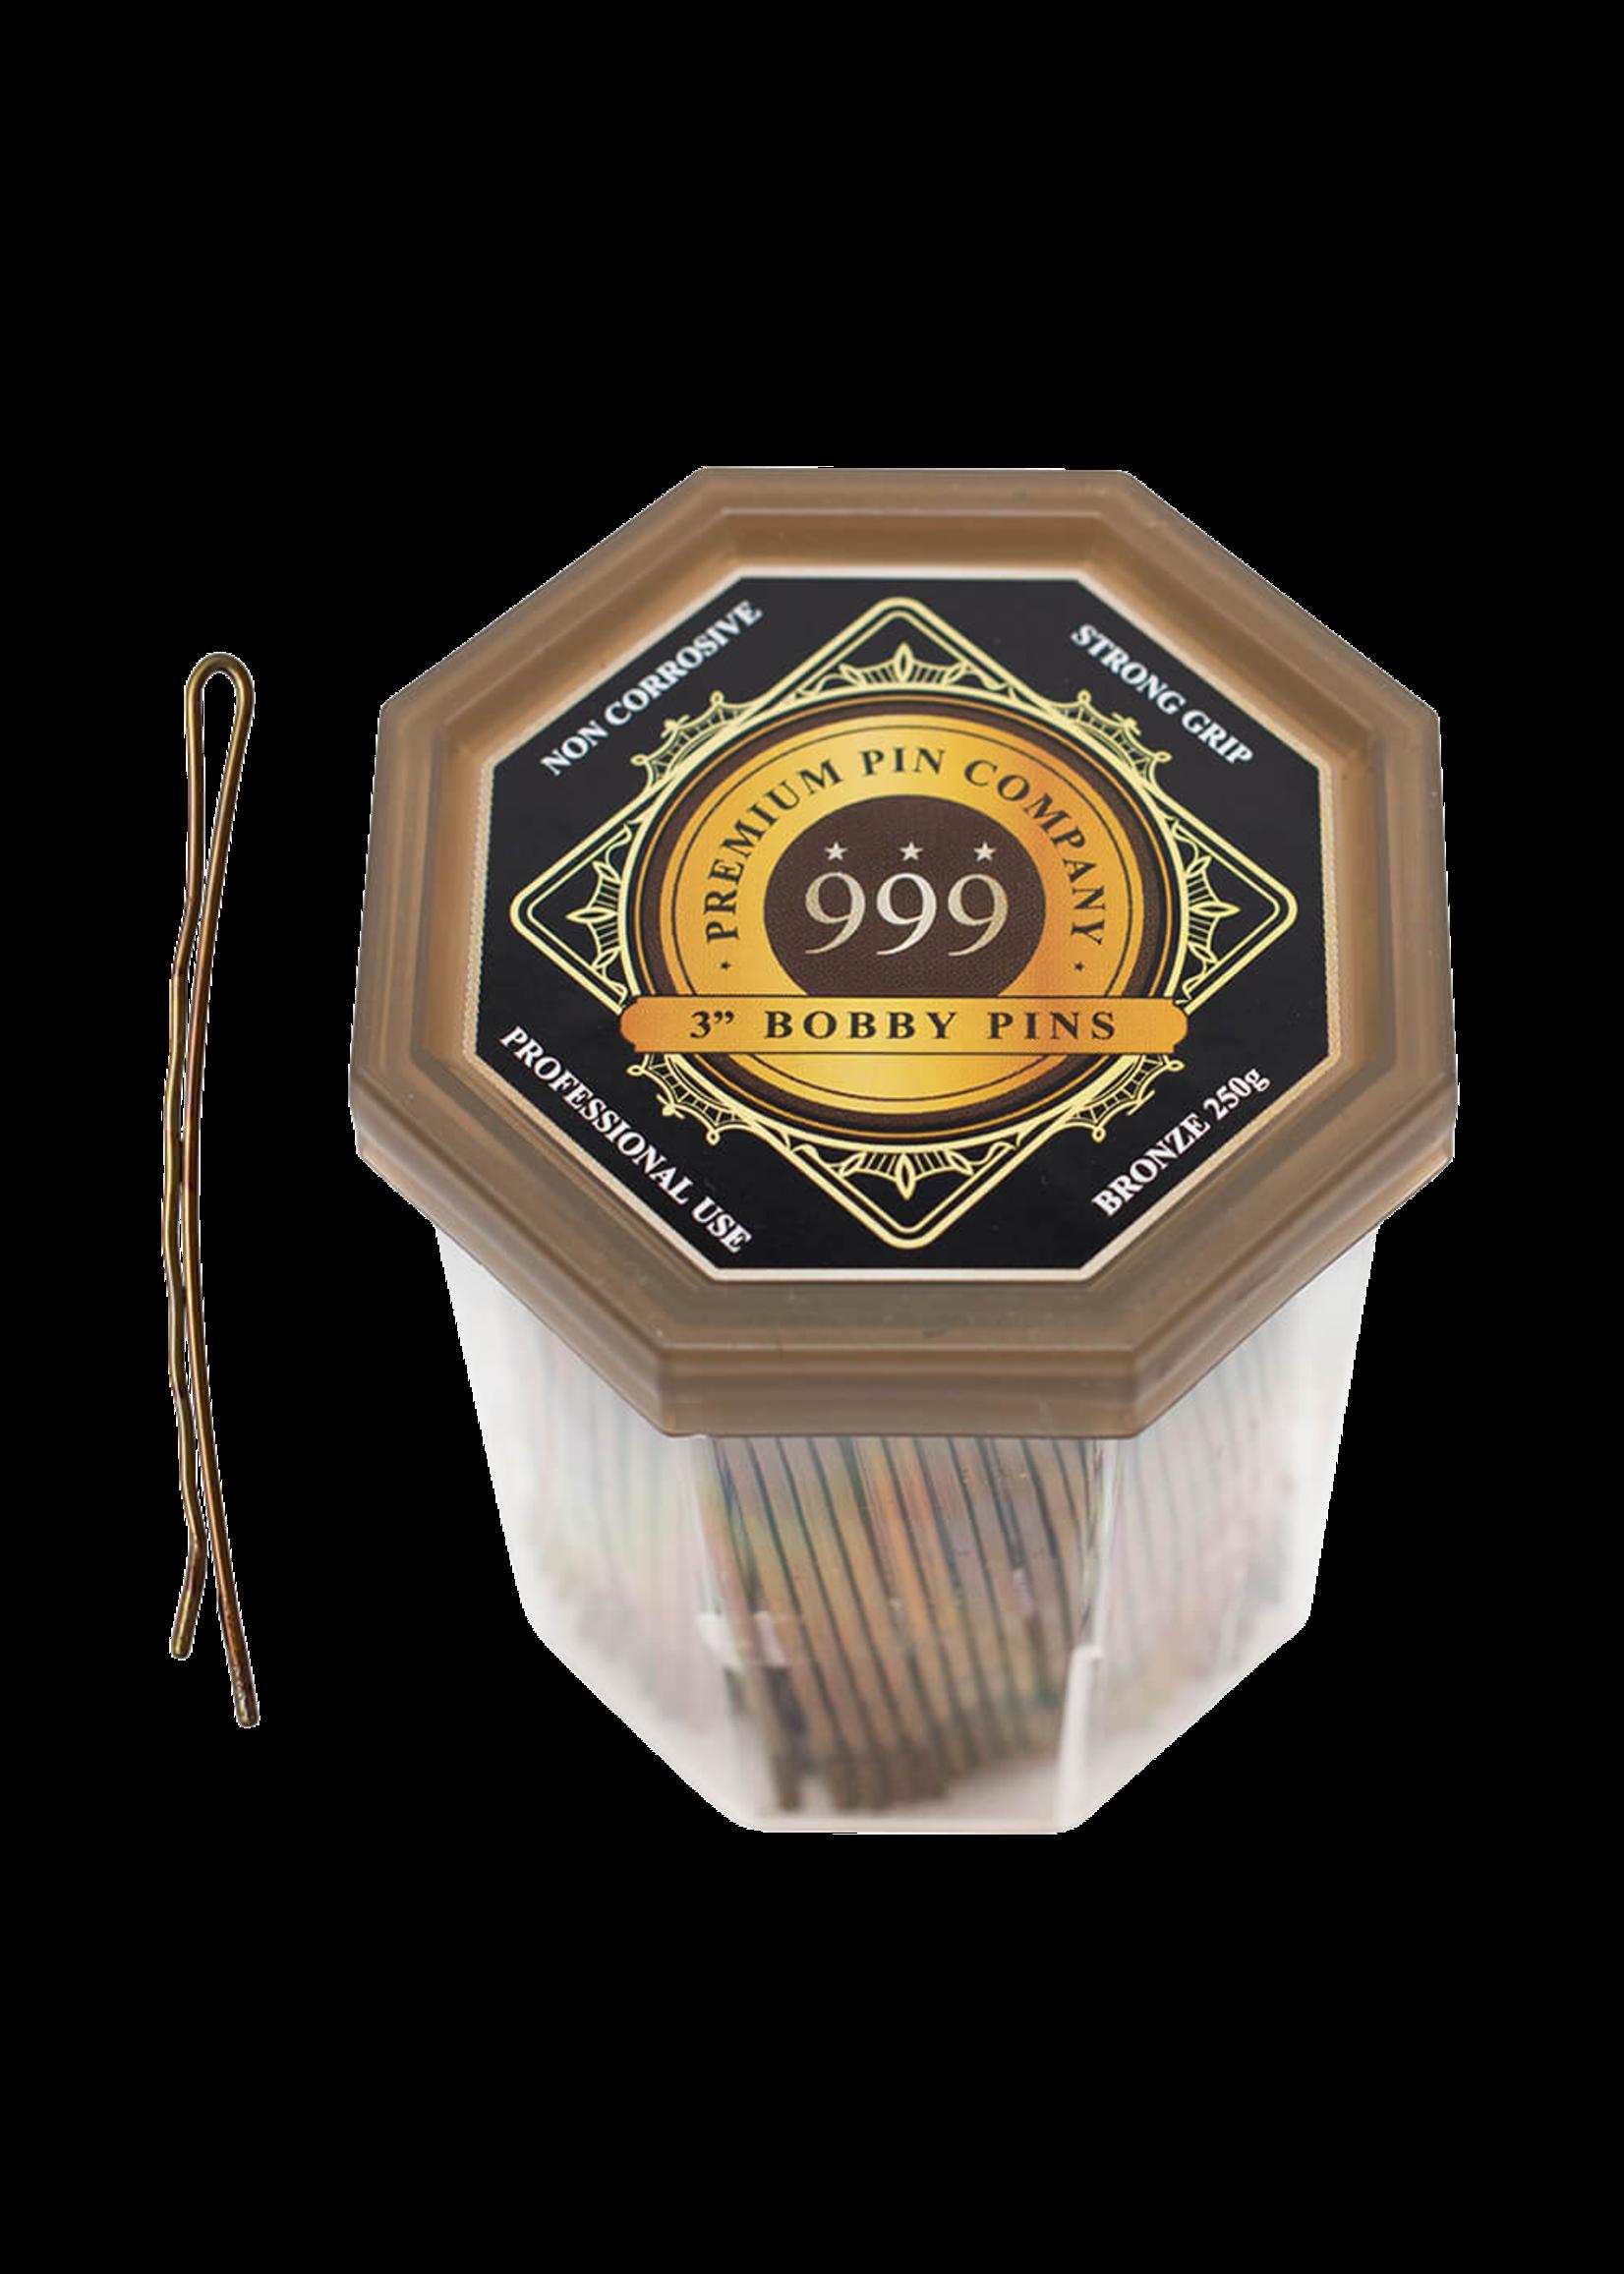 "999 Premium Pin Company 999 Bobby Pins 3"" Bronze Tub 250g"